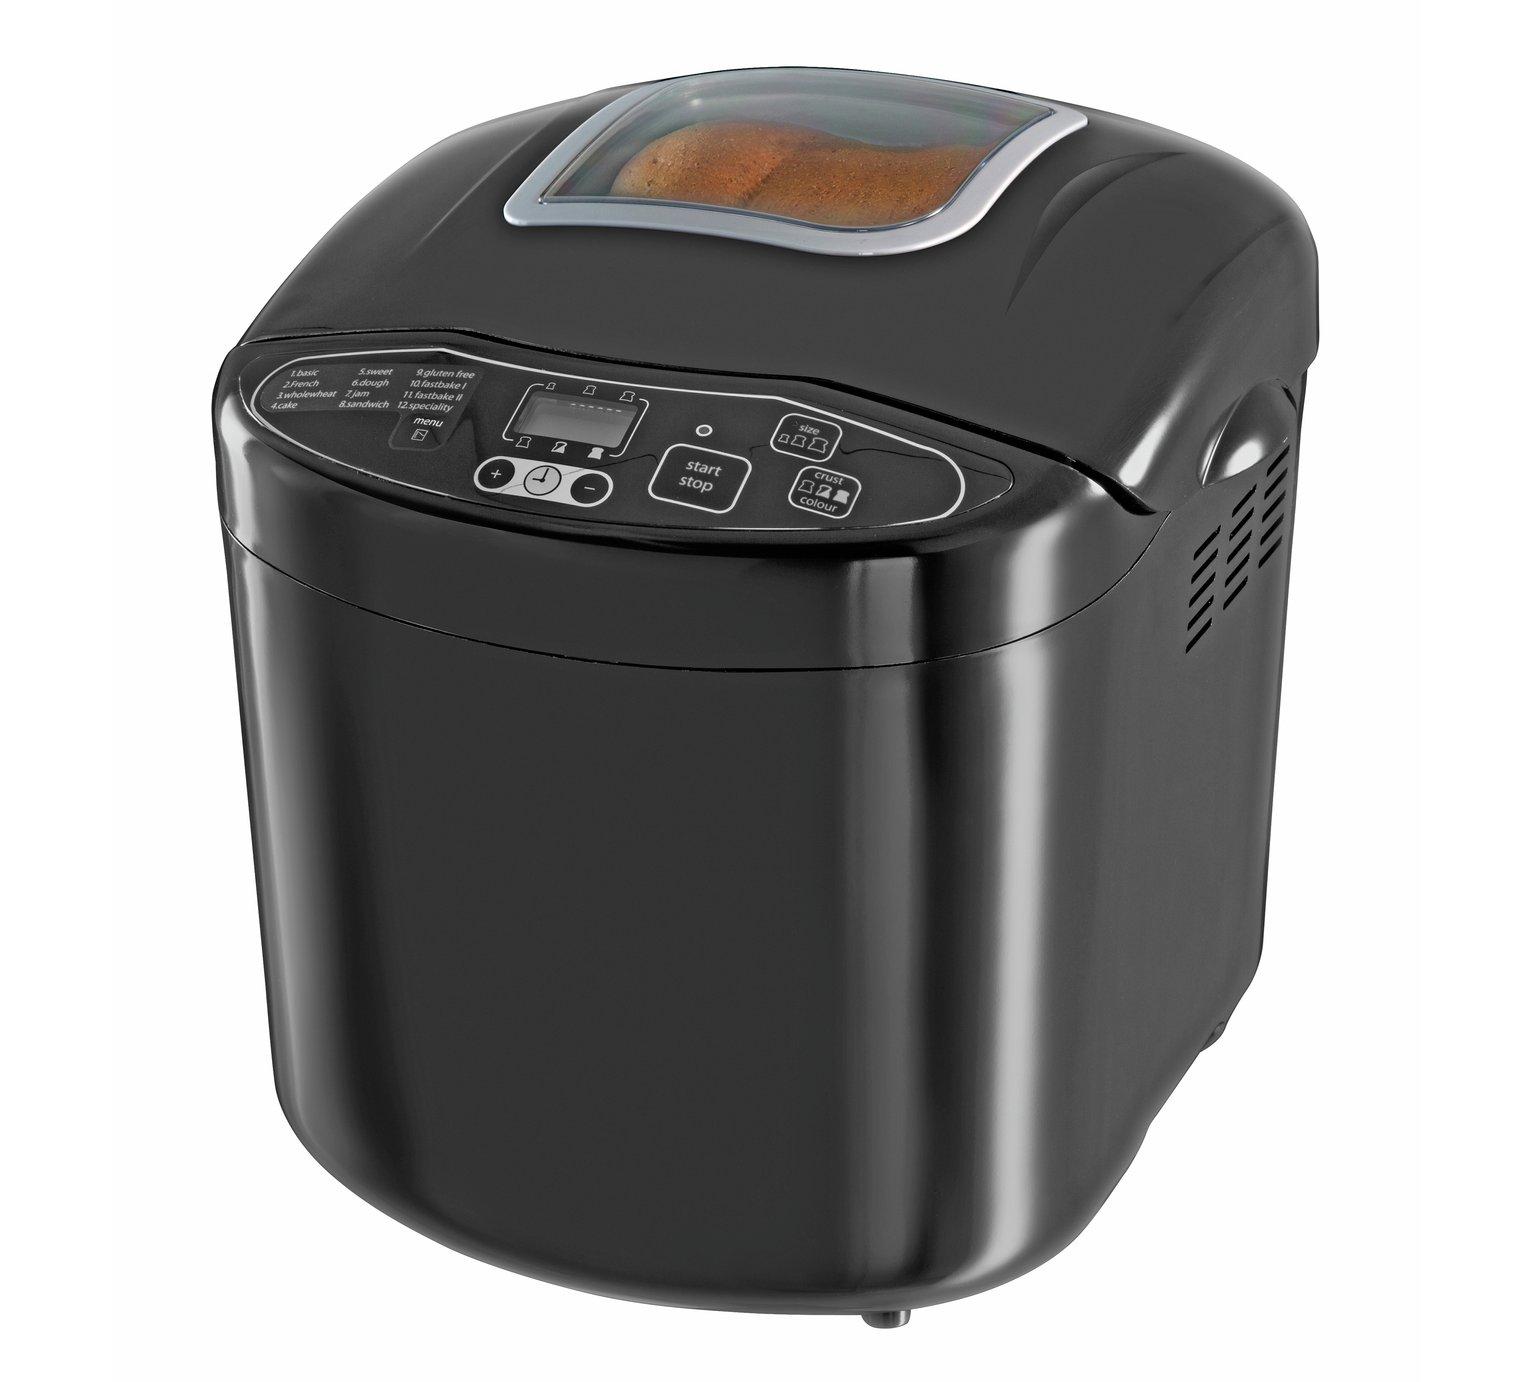 Russell Hobbs 23620 Compact Breadmaker - Black